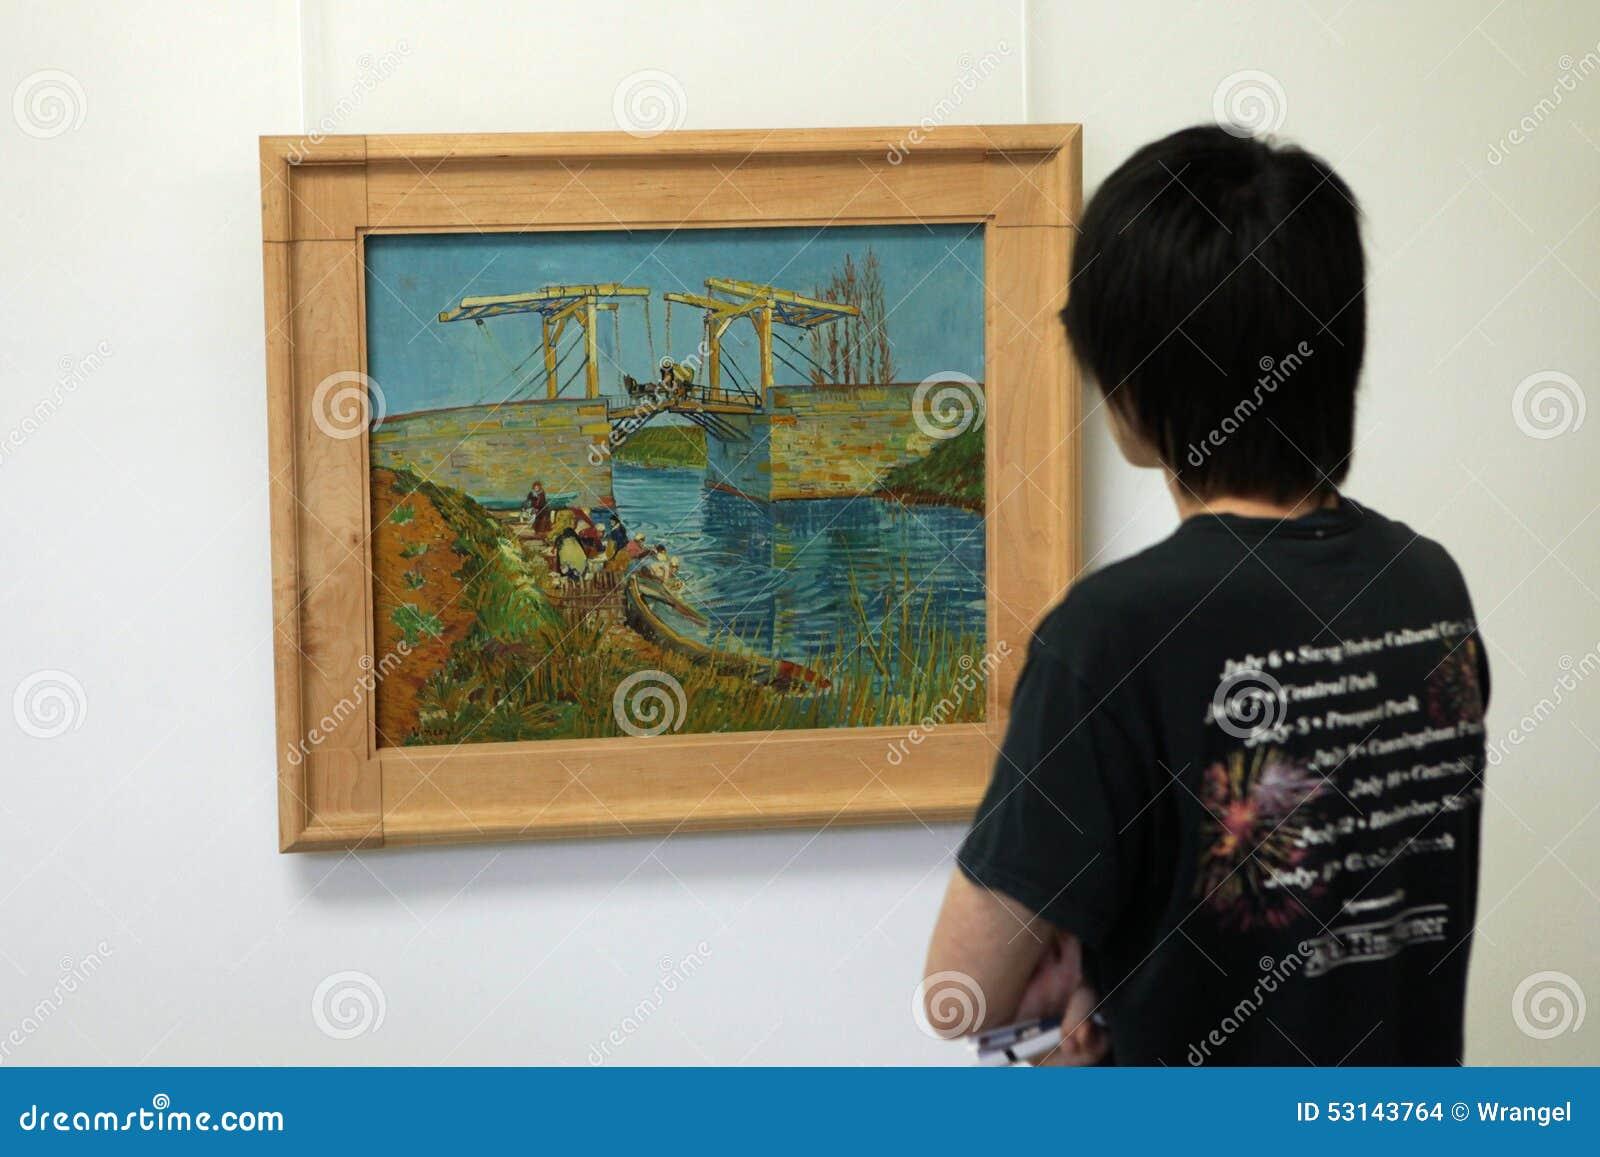 Vincent van Gogh in the Kroller Muller Museum, Otterlo